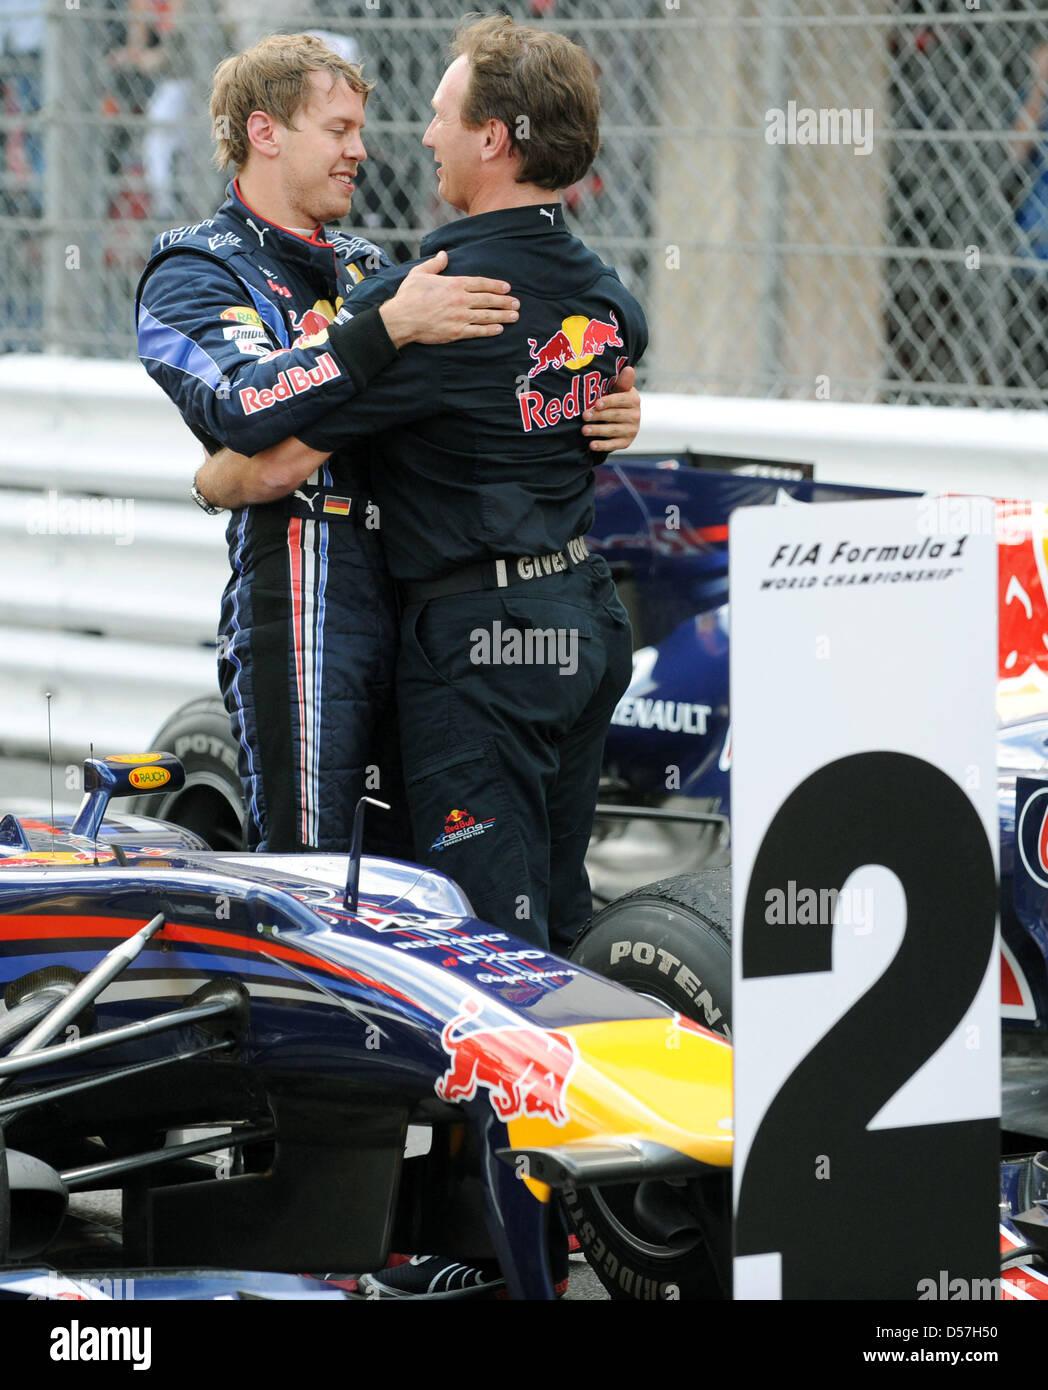 b6f47b39 German driver Sebastian Vettel of Red Bull Racing (L) and his team  principal Christian Horner (R) hug after the 2010 Formula 1 Grand Prix of  Monace held in ...